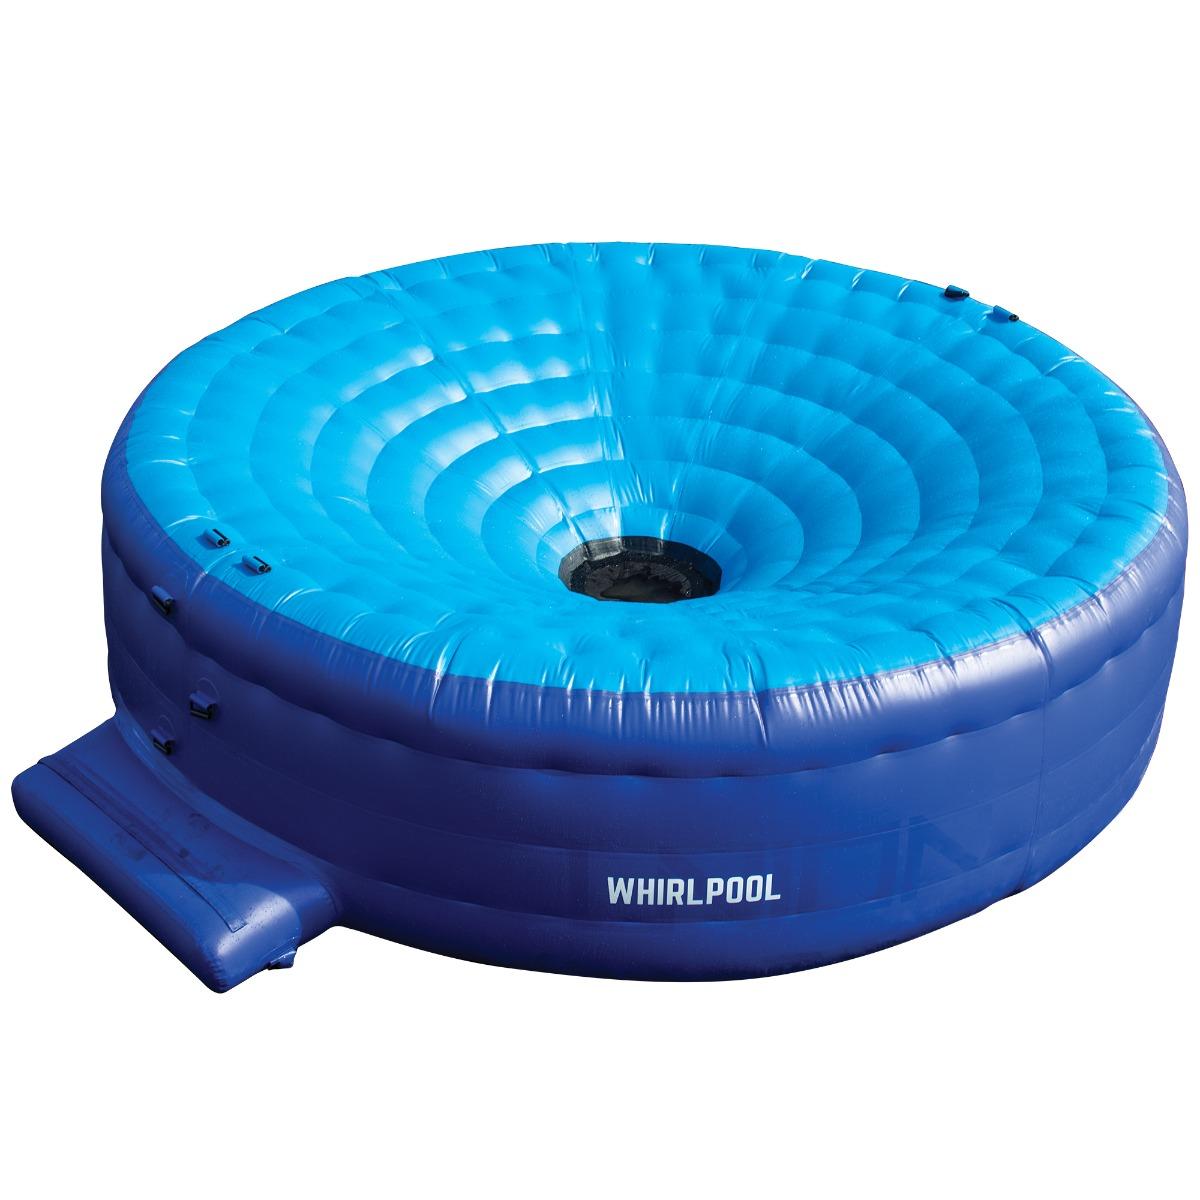 User Manual: Union Aquaparks Whirlpool